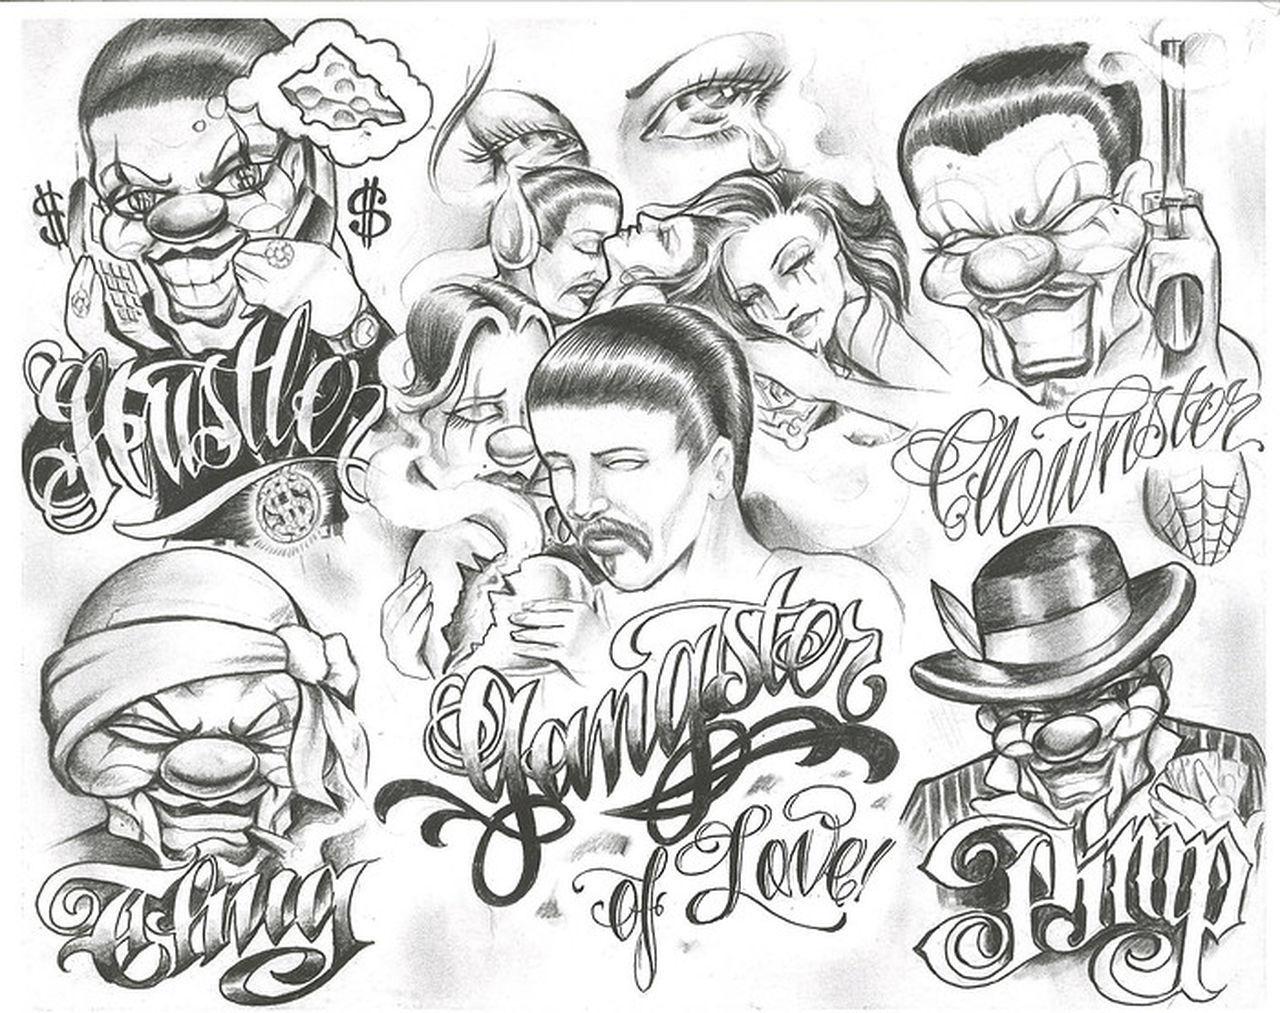 Arrangement Art Body Art #tattoo #ink Body Art Tattoo Ink [ Close-up Creativity Decor Decoration Design Ideas Ink Drawing No People Ornate Still Life Studio Shot Tatted Tattoo Tattoo Design Tattoo ❤ Tattooartist  Tattooed Tattooedgirls Tattoomodels Tattoos Tattoshop